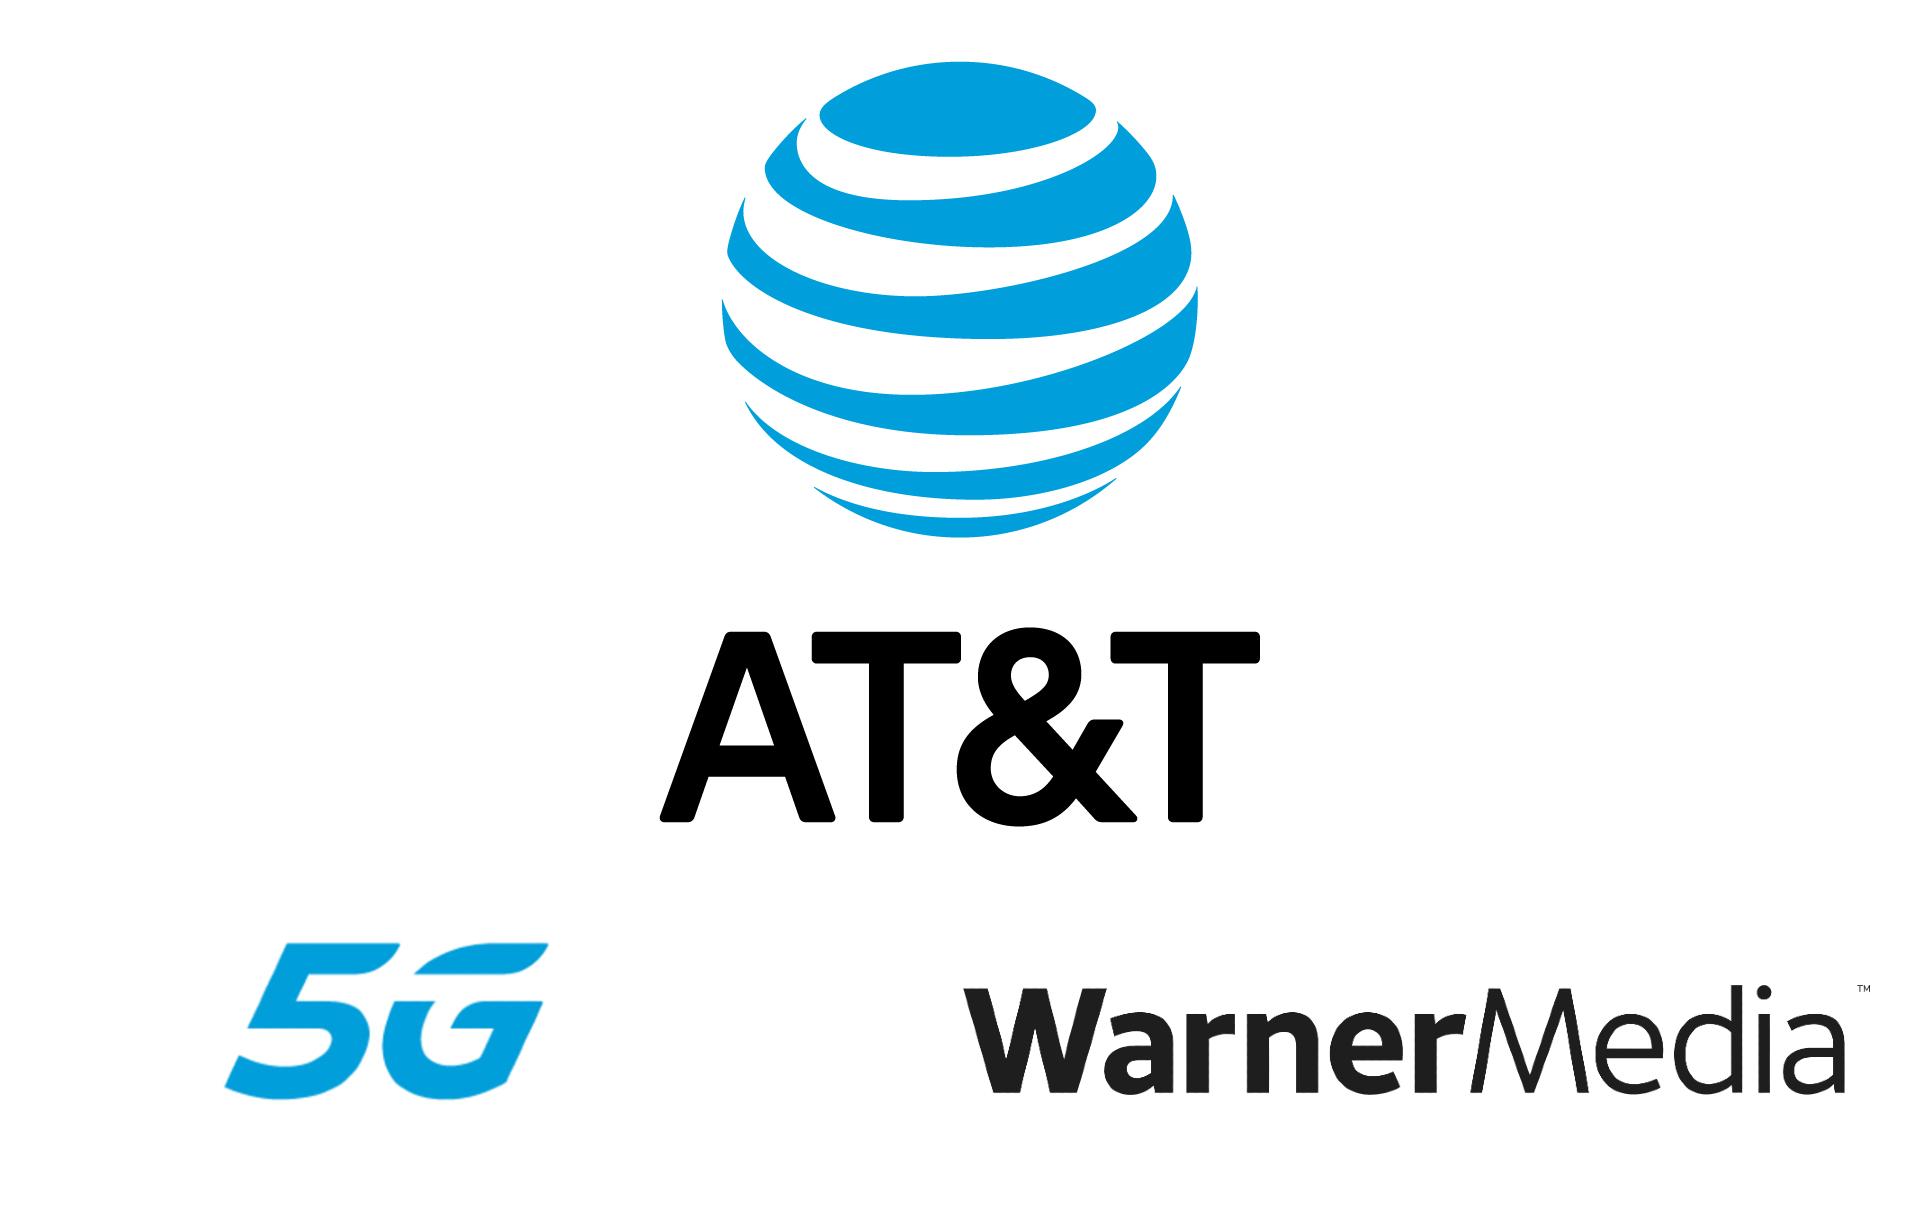 AT&T analýza akcie